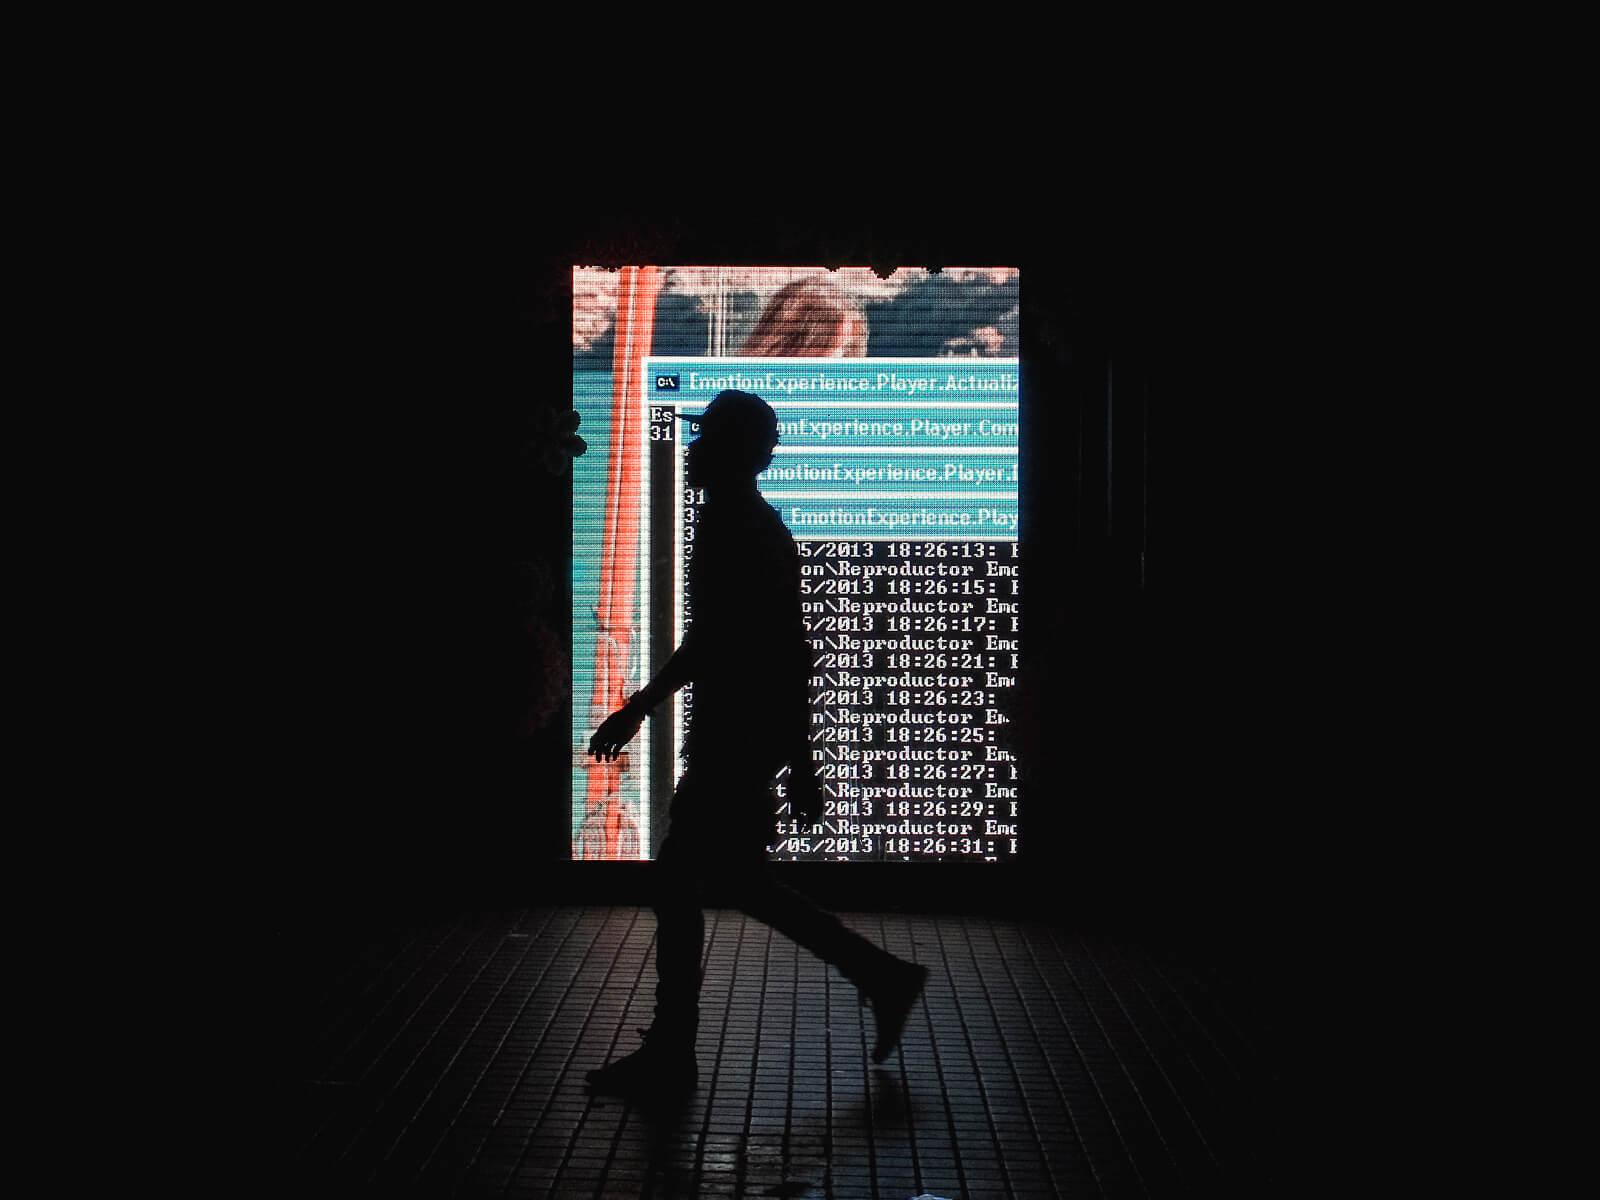 Barcelona, EmotionExperience.Player, advertising display, dos window, sidewalk silhouette walking